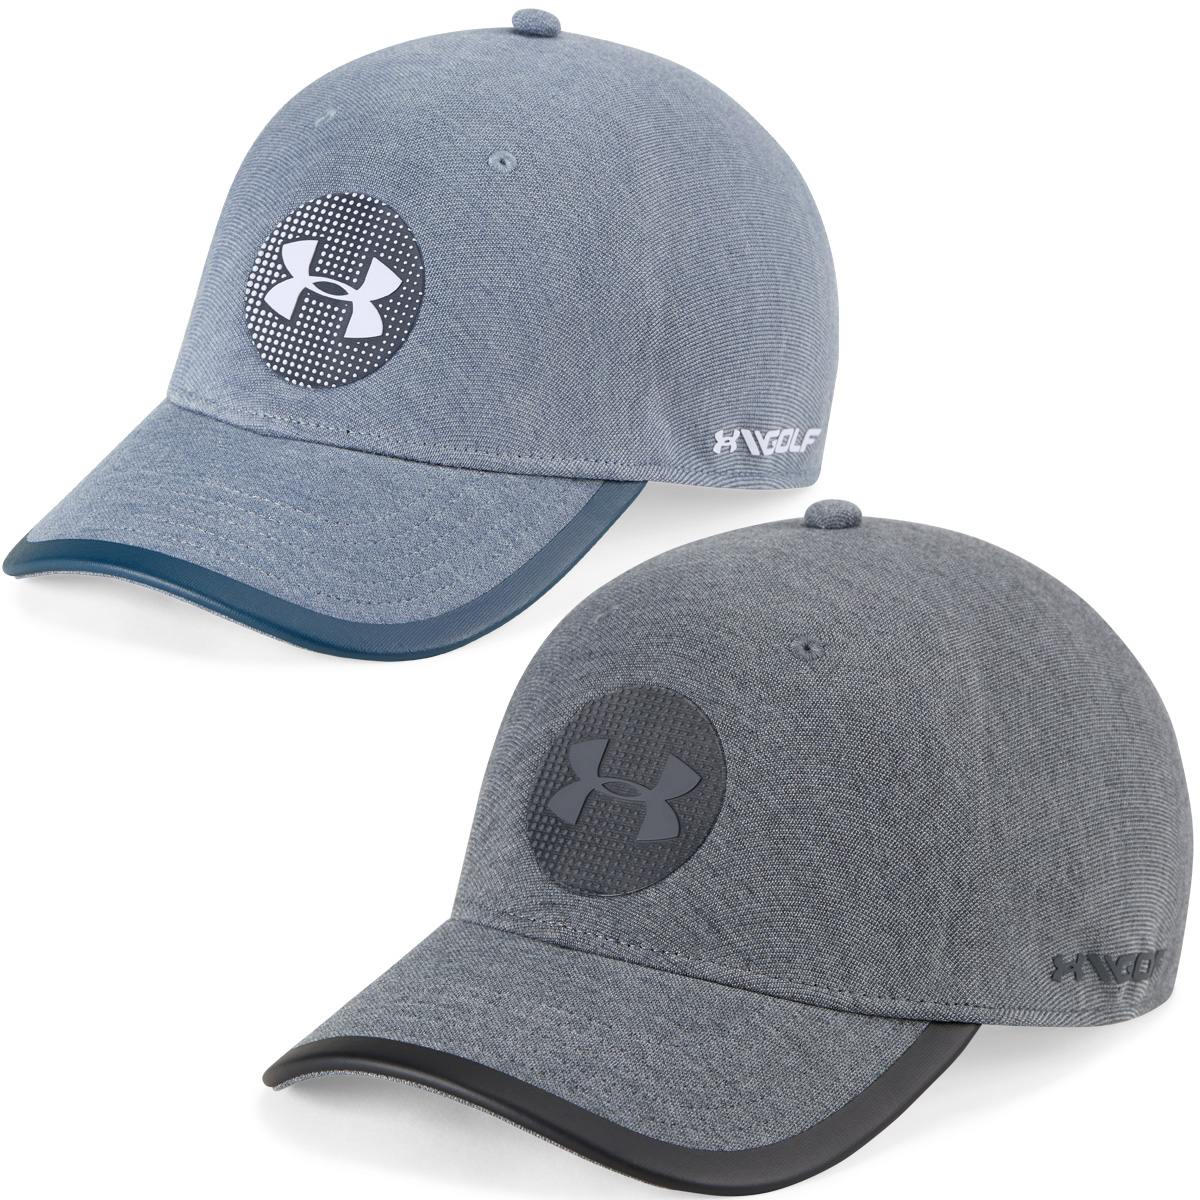 fa5e5d0563b Details about Under Armour Mens 2019 Elevated TB Tour Baseball Cap Jordan  Spieth Golf Hat